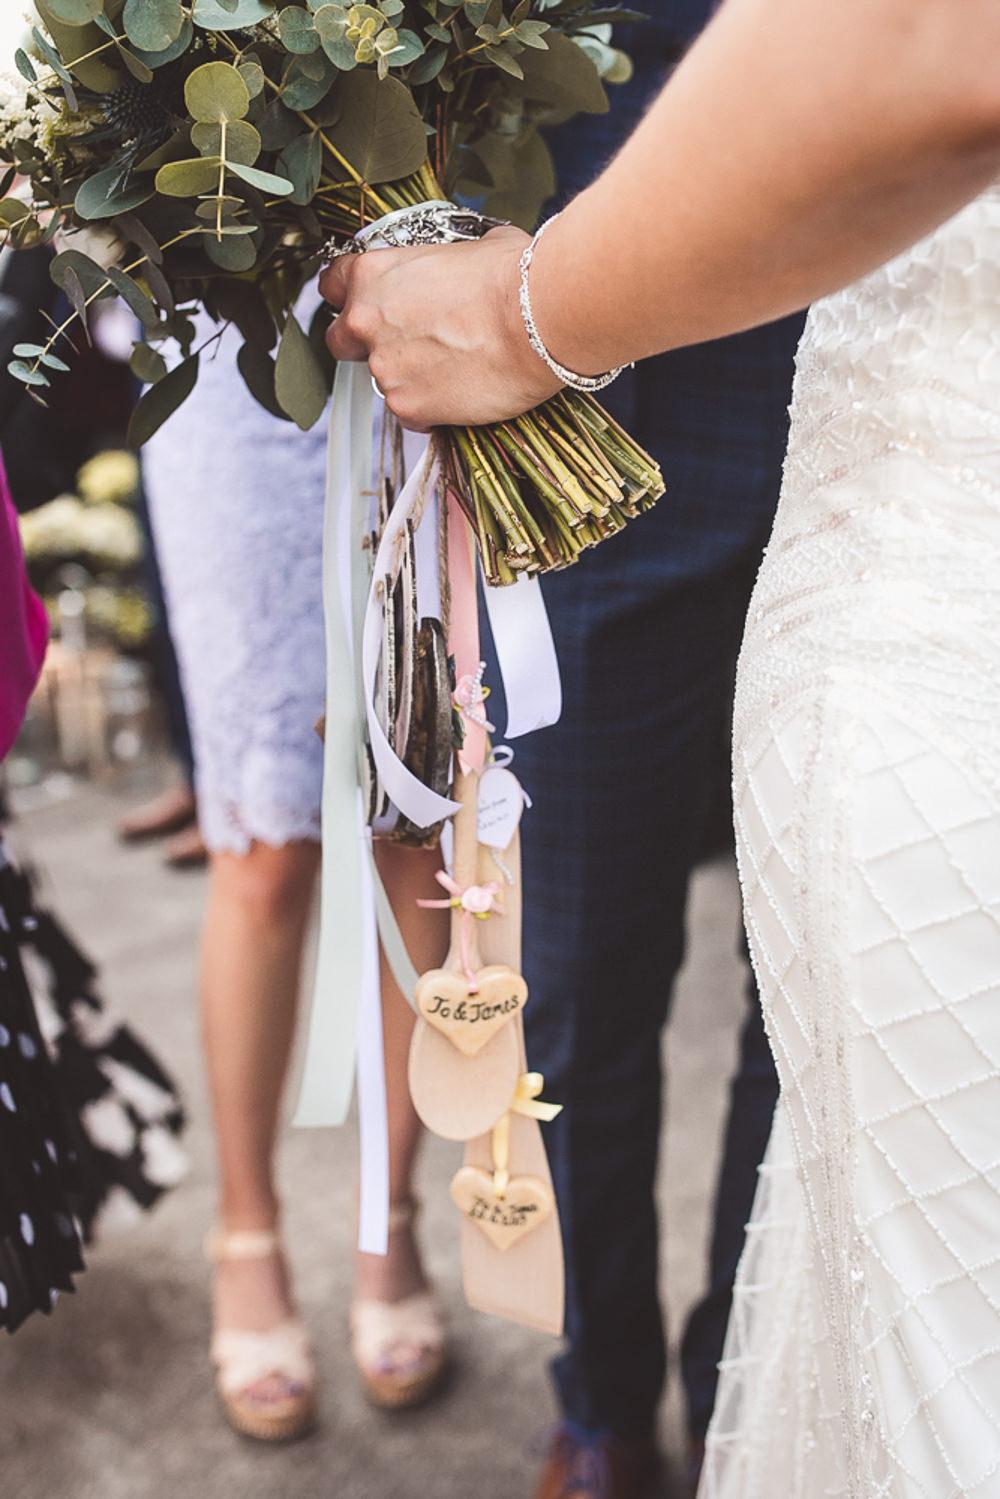 Bouquet Charms Bride Bridal Barn Wedding Shropshire Brightwing Photography